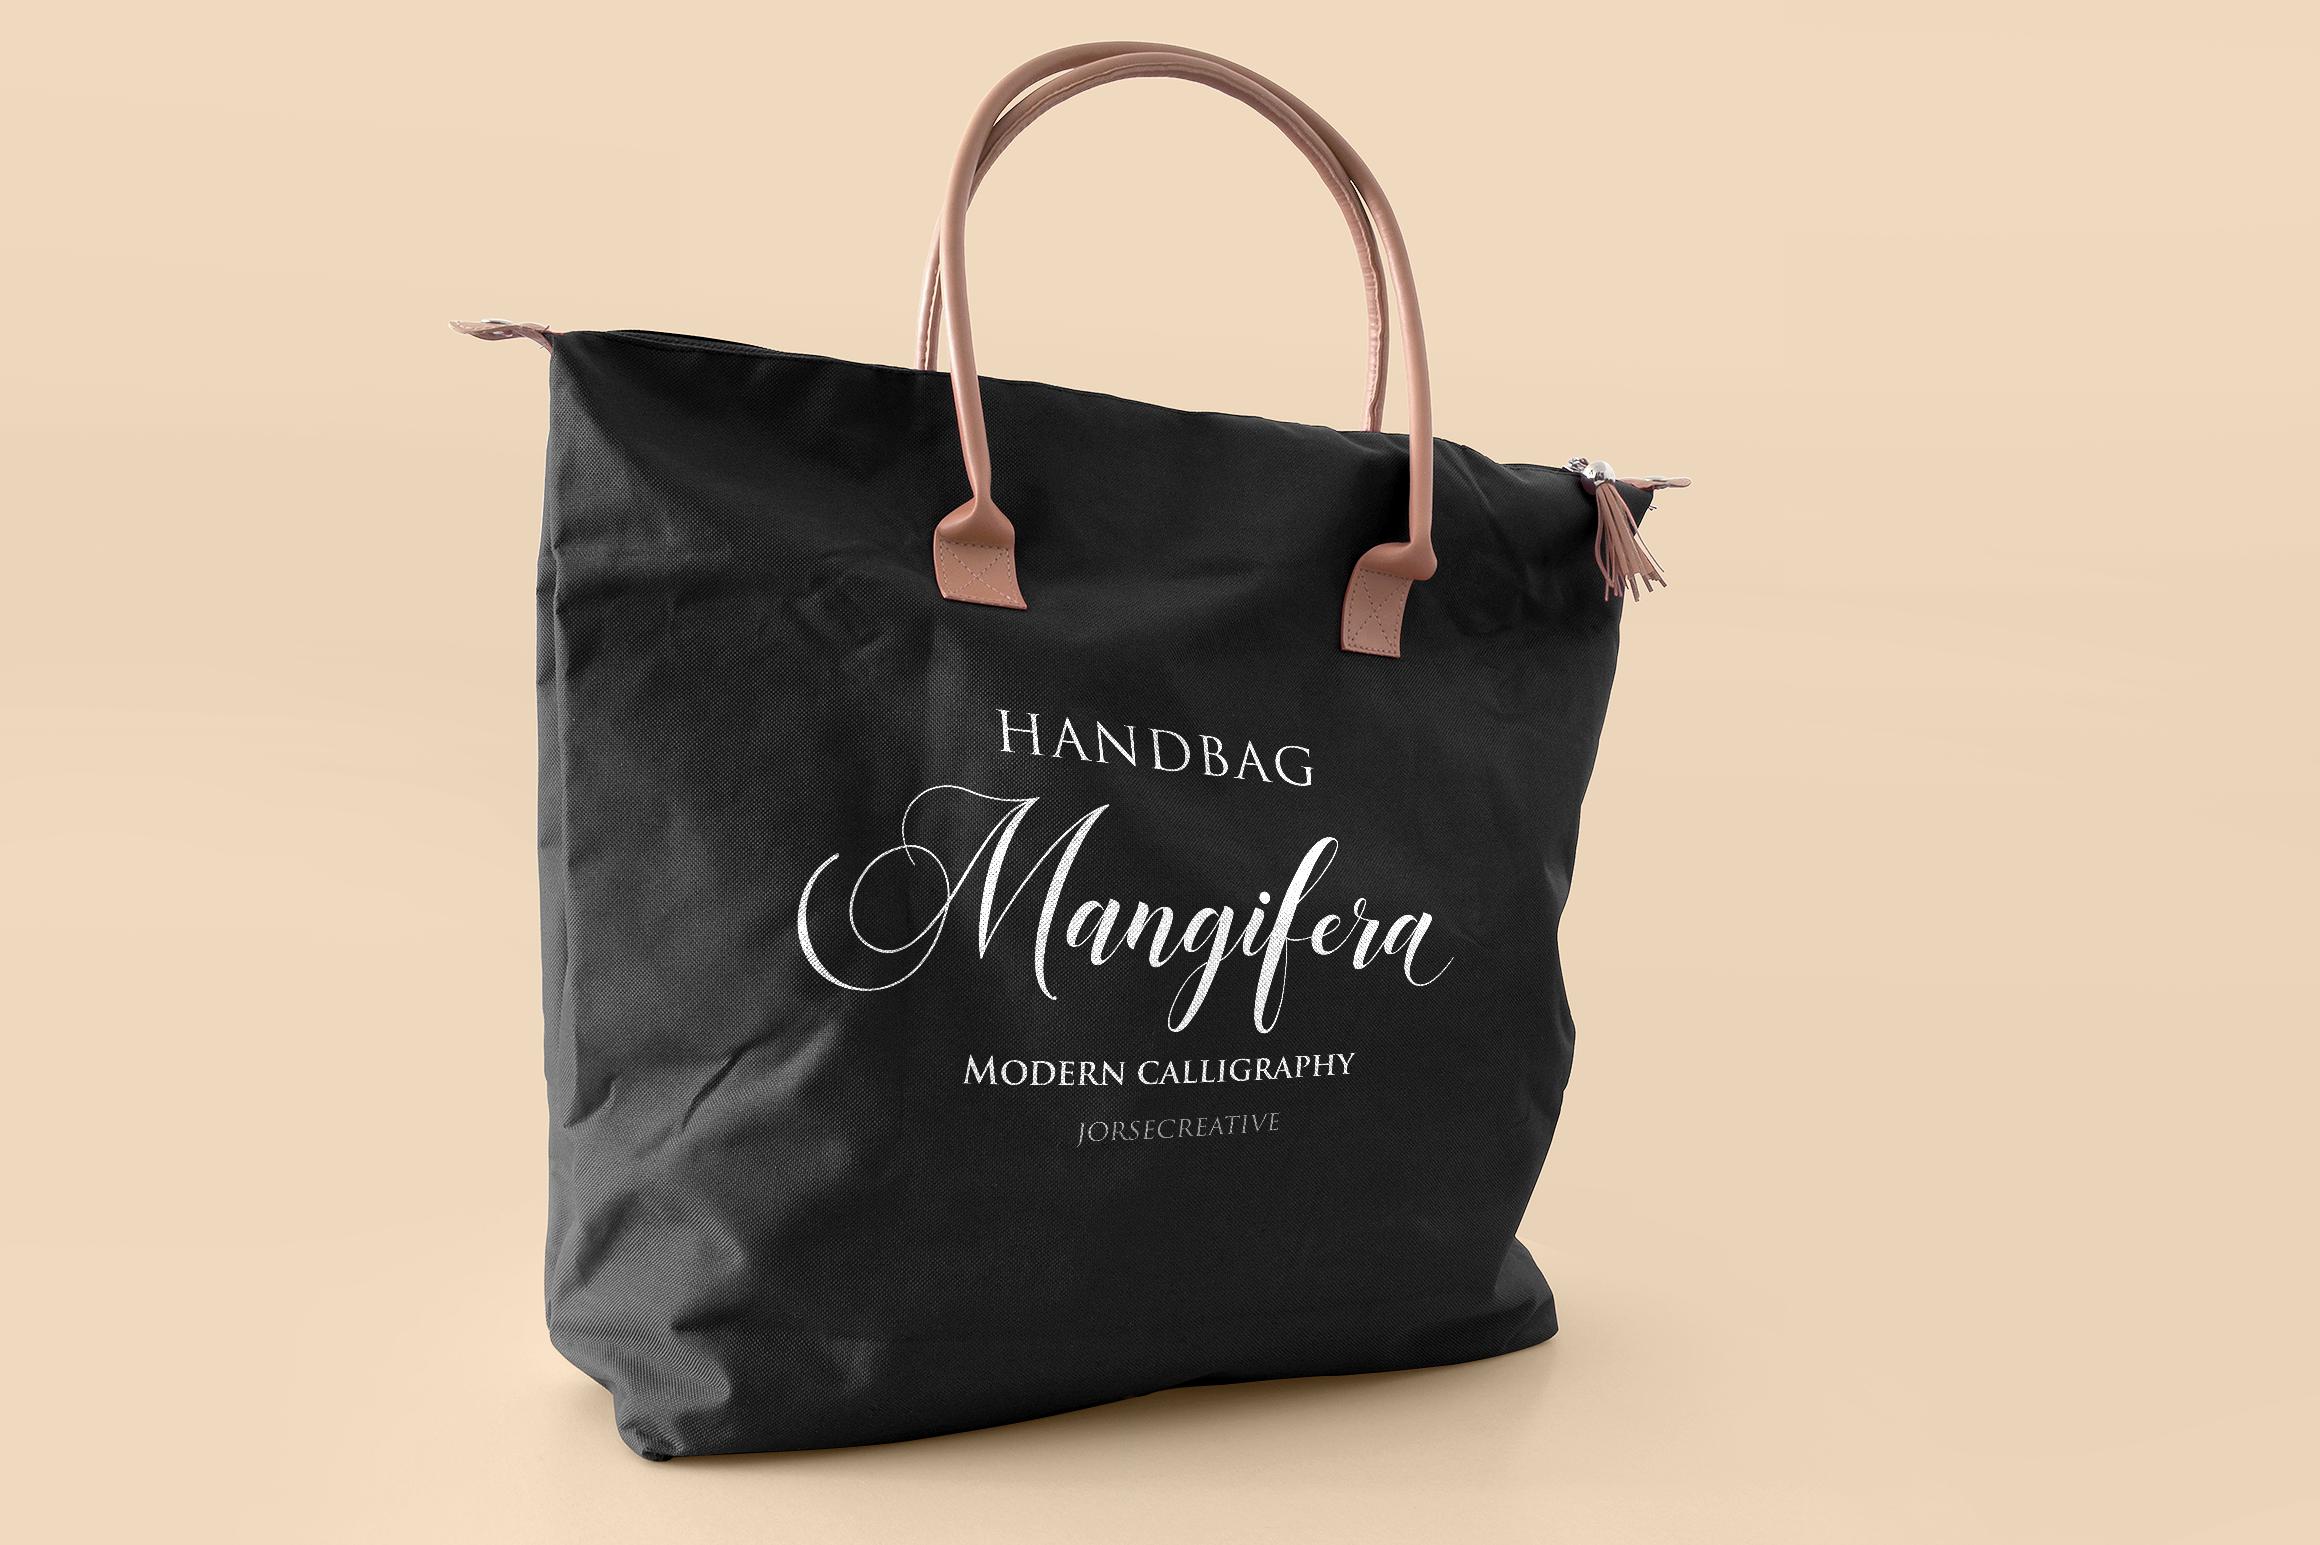 Mangifera handbag